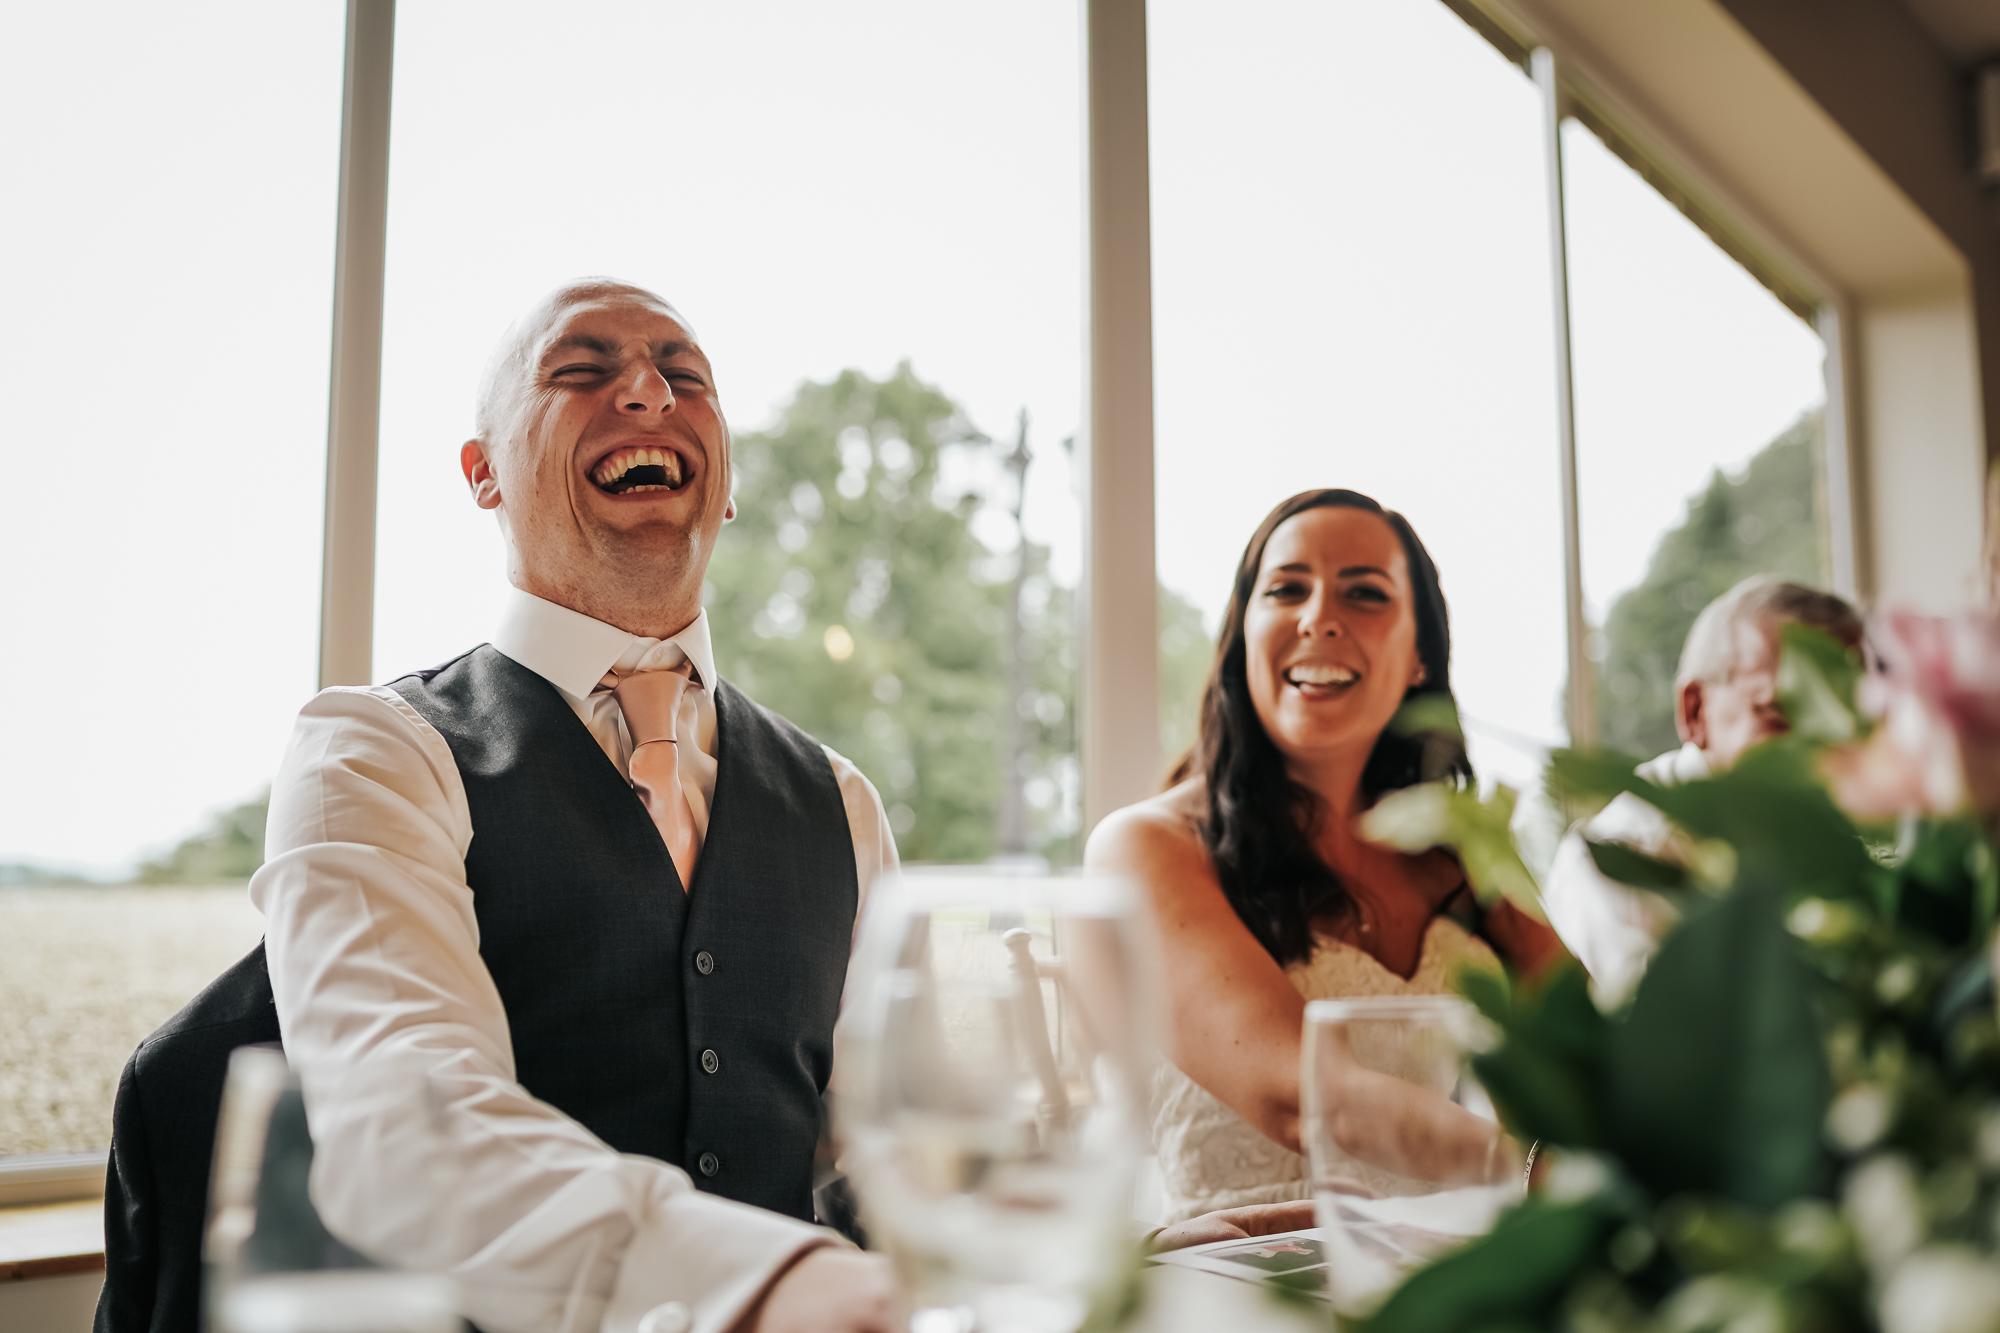 Hyde Bank Farm Wedding Photography Manchester wedding photographer (40 of 49).jpg